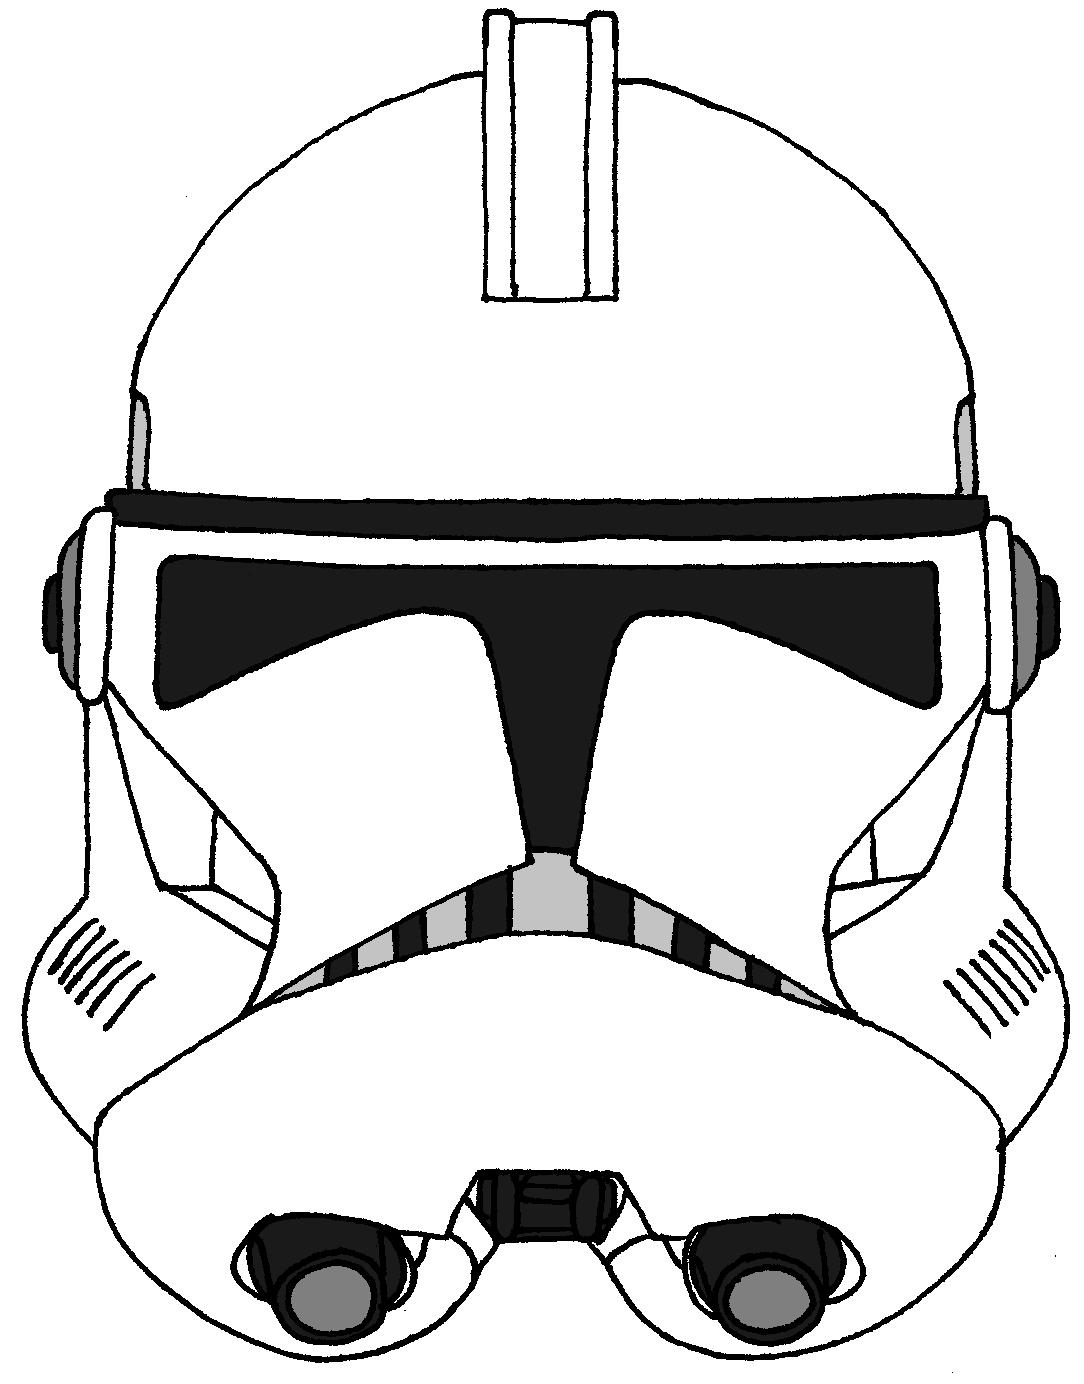 Clone Trooper Helmet Drawing at GetDrawings.com | Free for personal ...